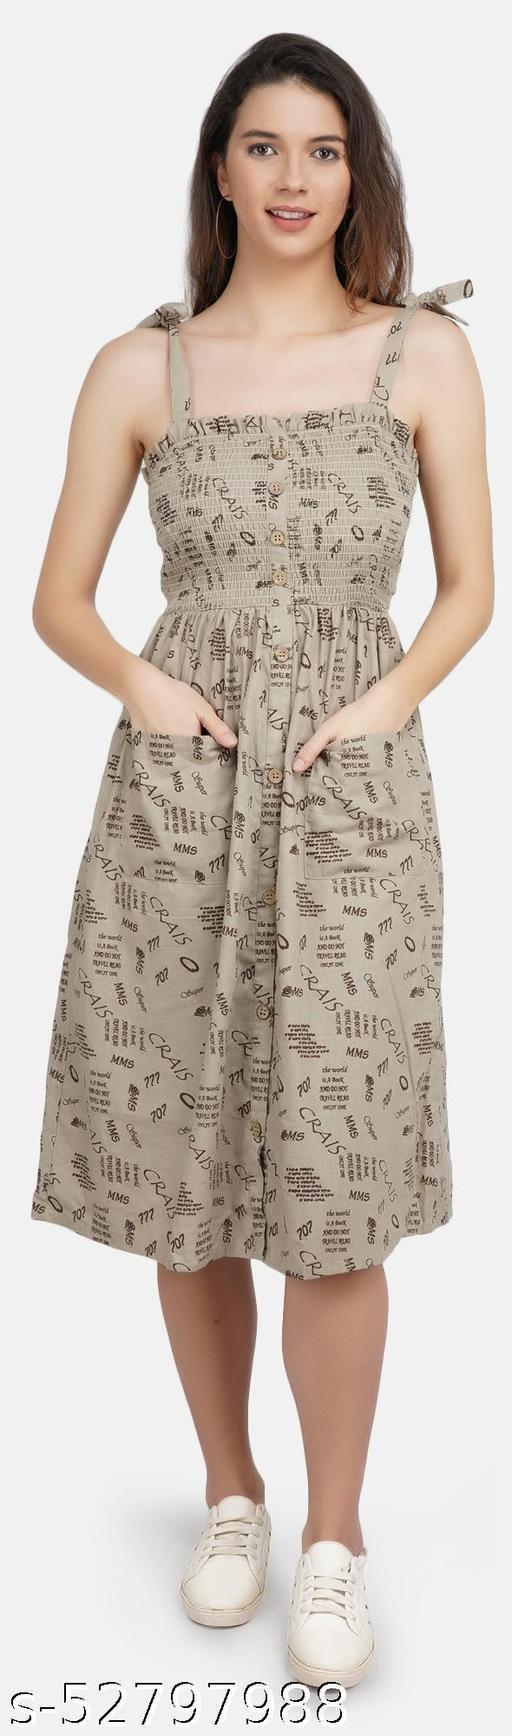 JAAIVE Grey Shoulder Straps Sleeveless with Smoking Above Knee Length Dress for Women Women Dress Dress for Women Girl Dress Dress for Girl Dresses Dress Casual Dress Grey Dress